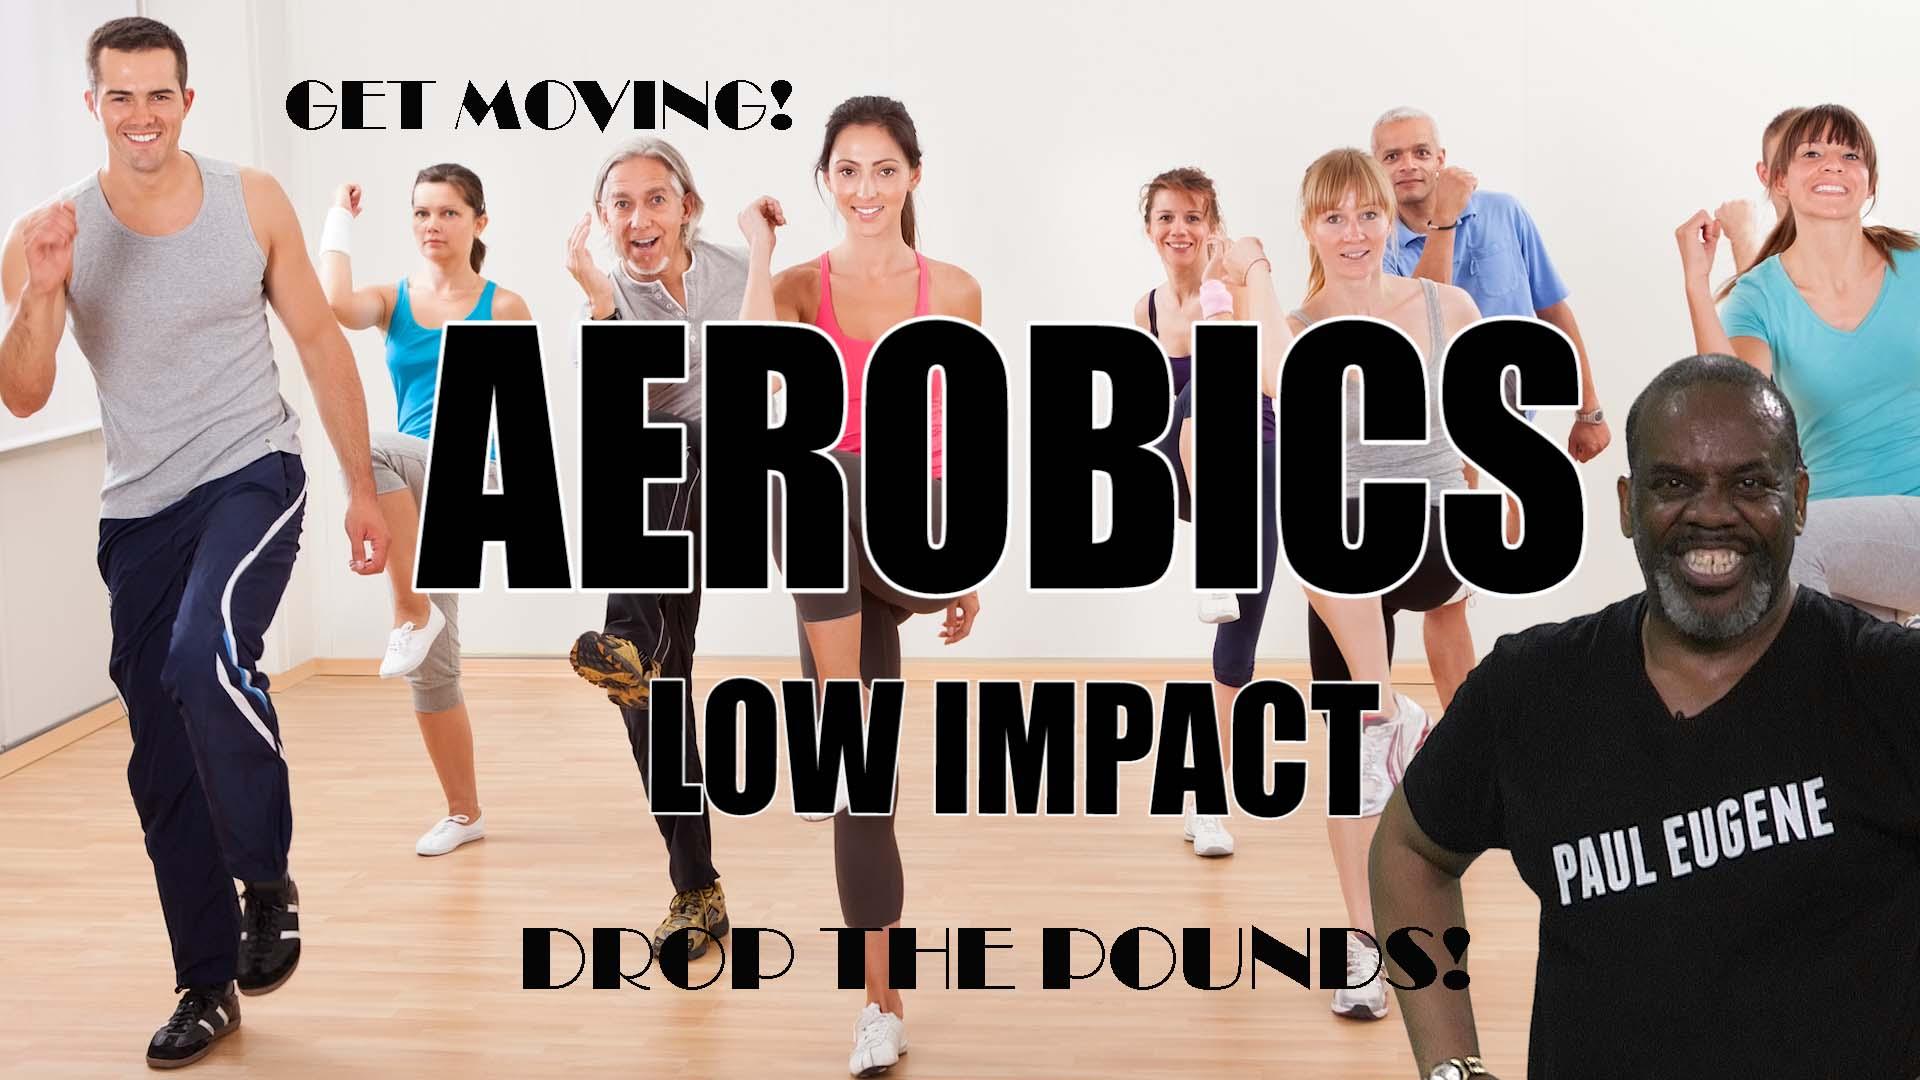 Aerobics Low Impact